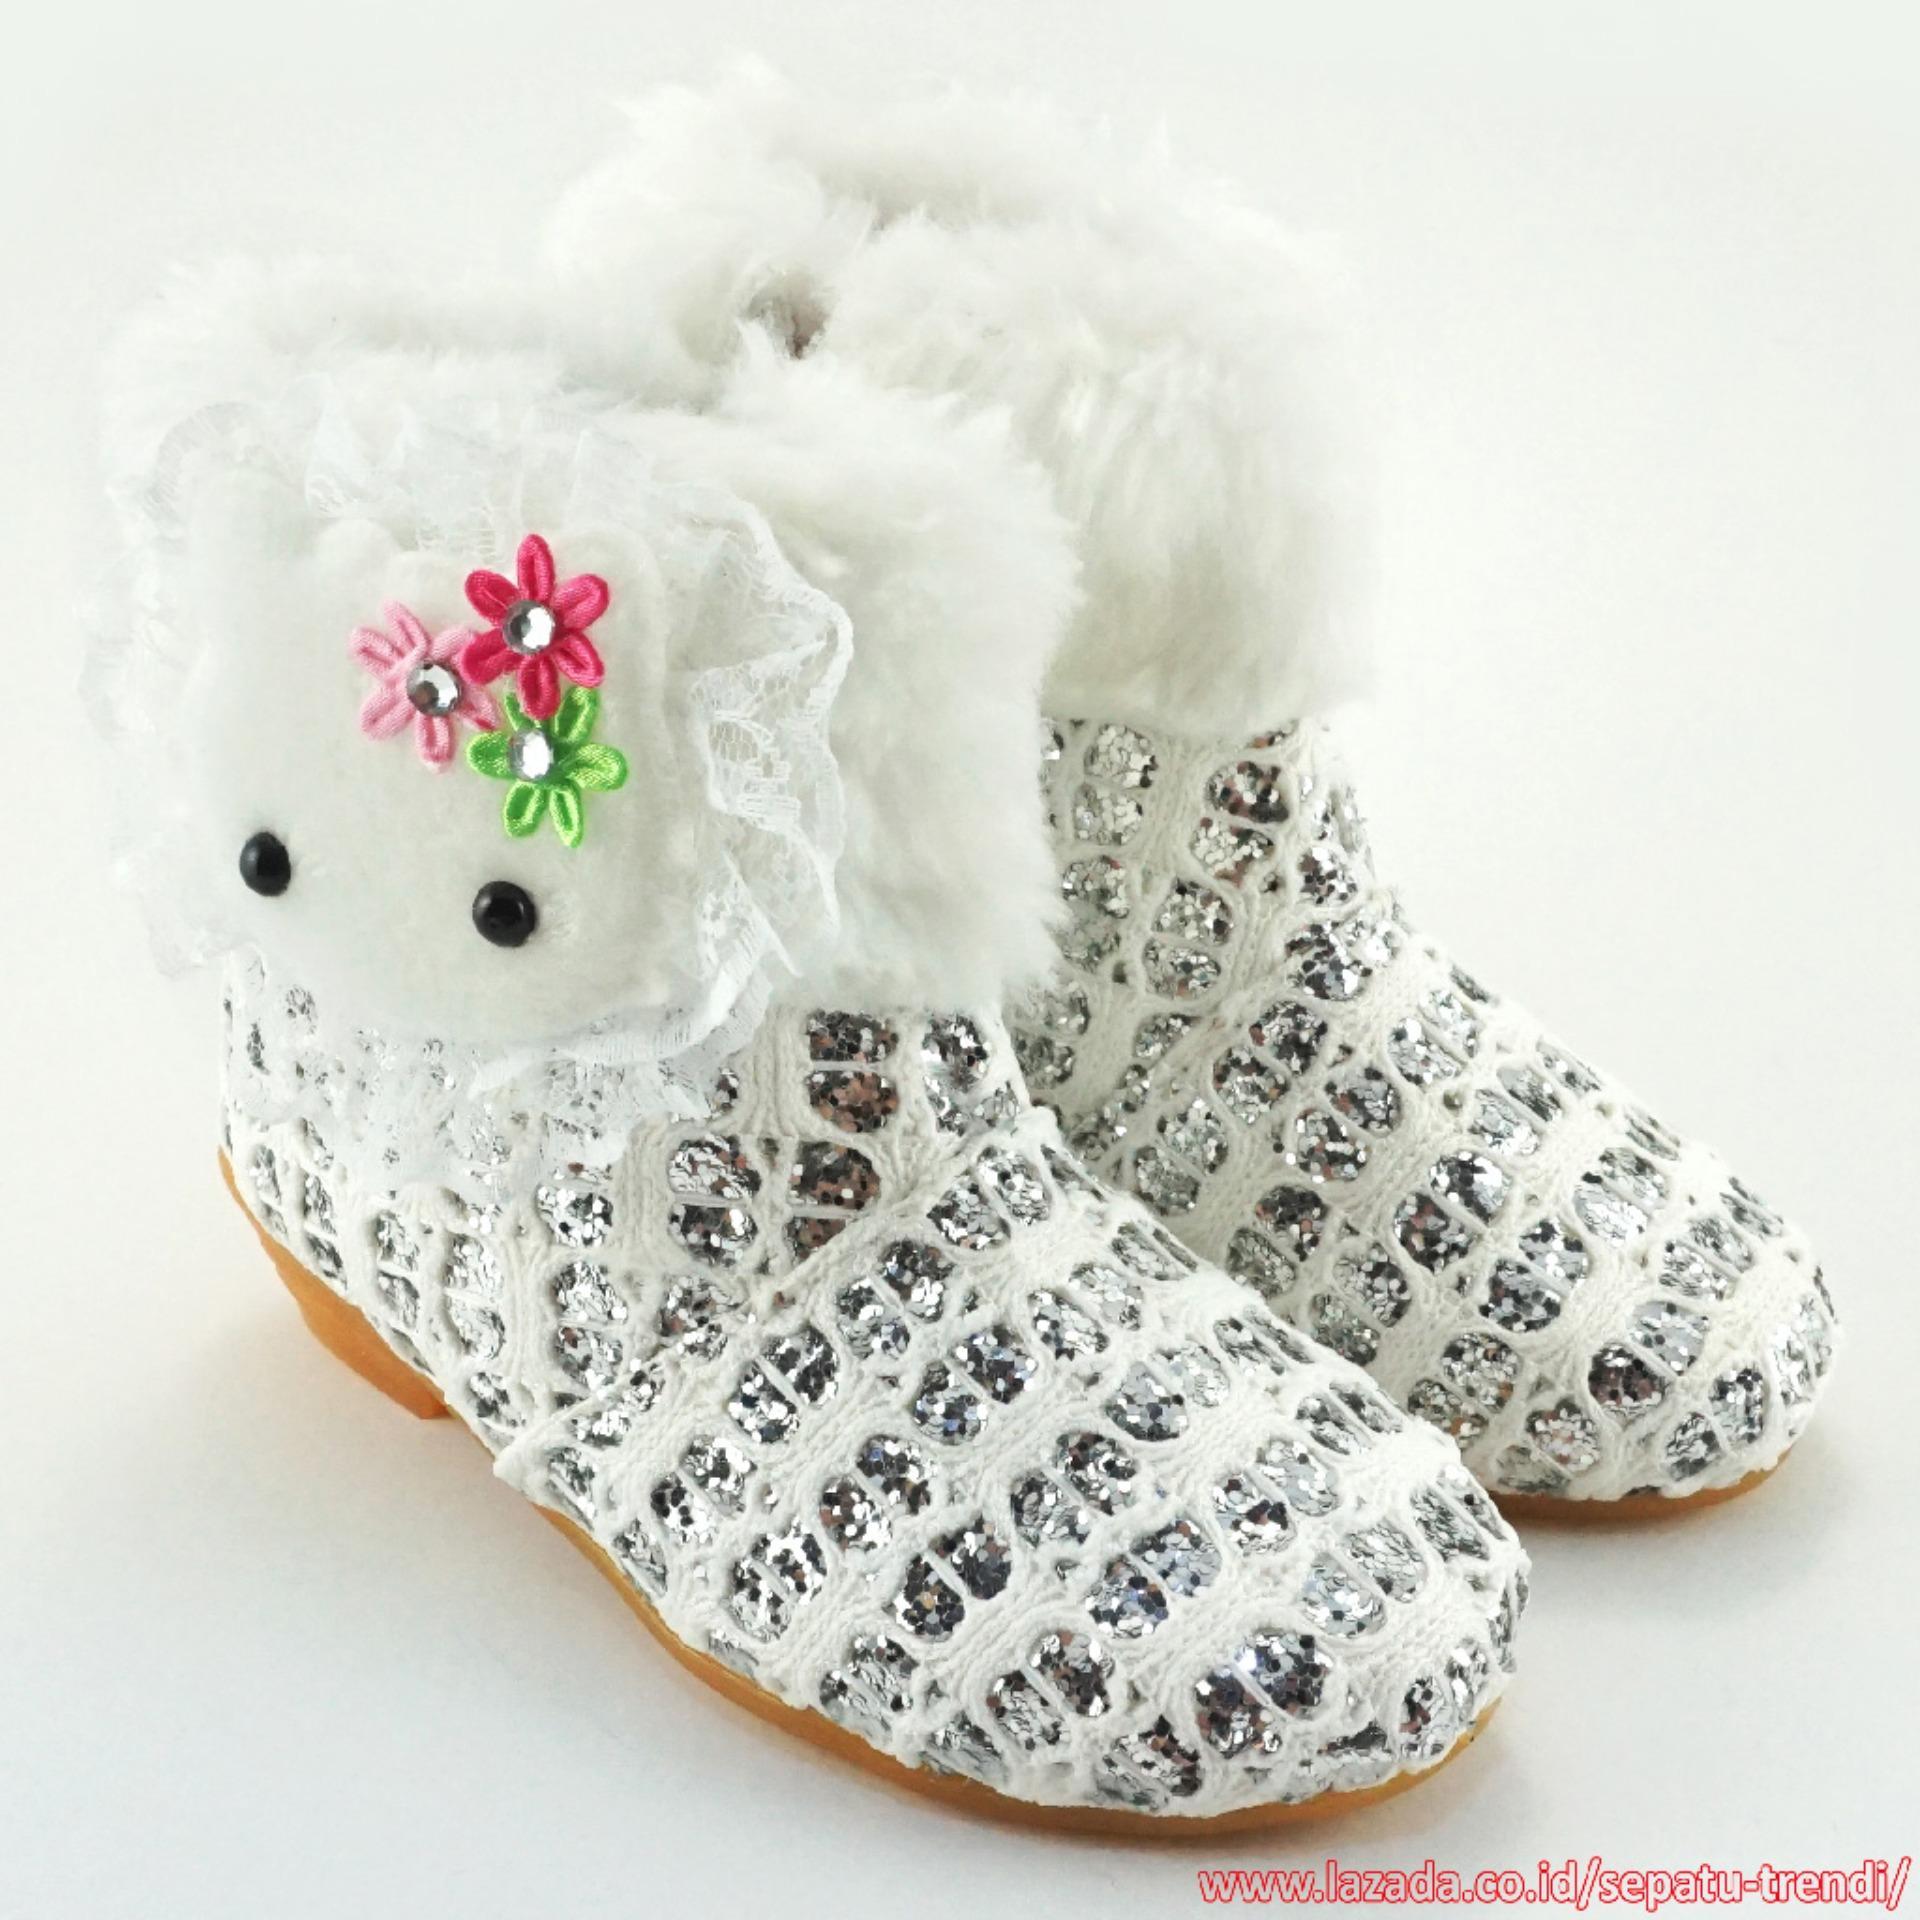 Harga Trendishoes Sepatu Boot Anak Perempuan Knit Glitter Boneka Bulu Silver Putih Terbaik